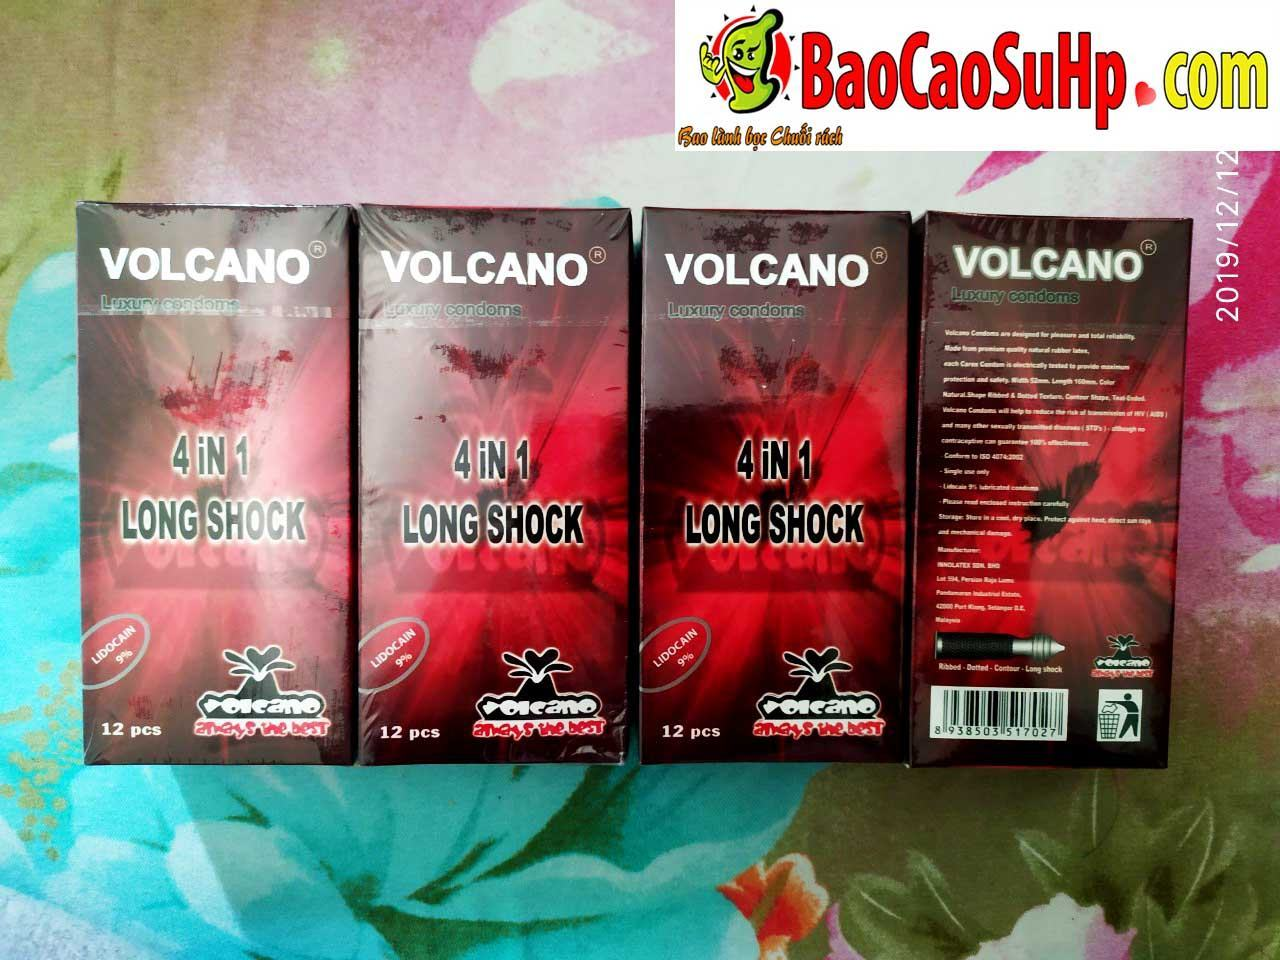 20191213092307 8523865 bao cao su volcano bao cao su hai phong - Bao cao su siêu mỏng kéo dài gân gai hàng về shop ngày 13.12.2019